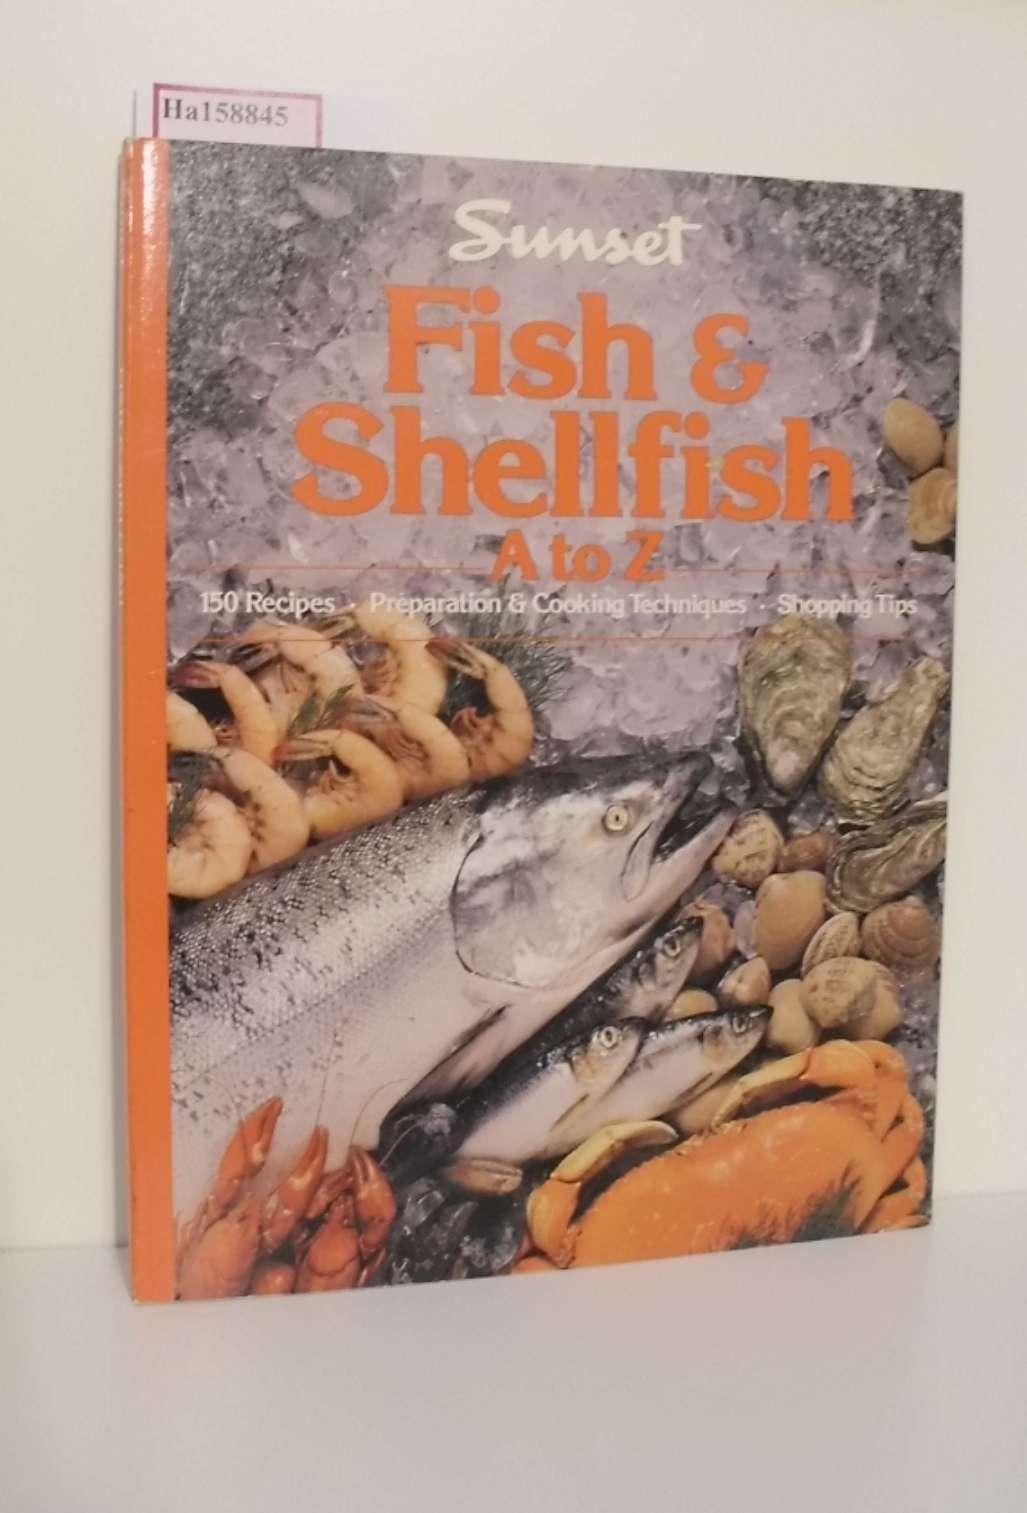 Fish  u.Shellfish A to Z Recipes -Preparation  u.Cooking TechniQues